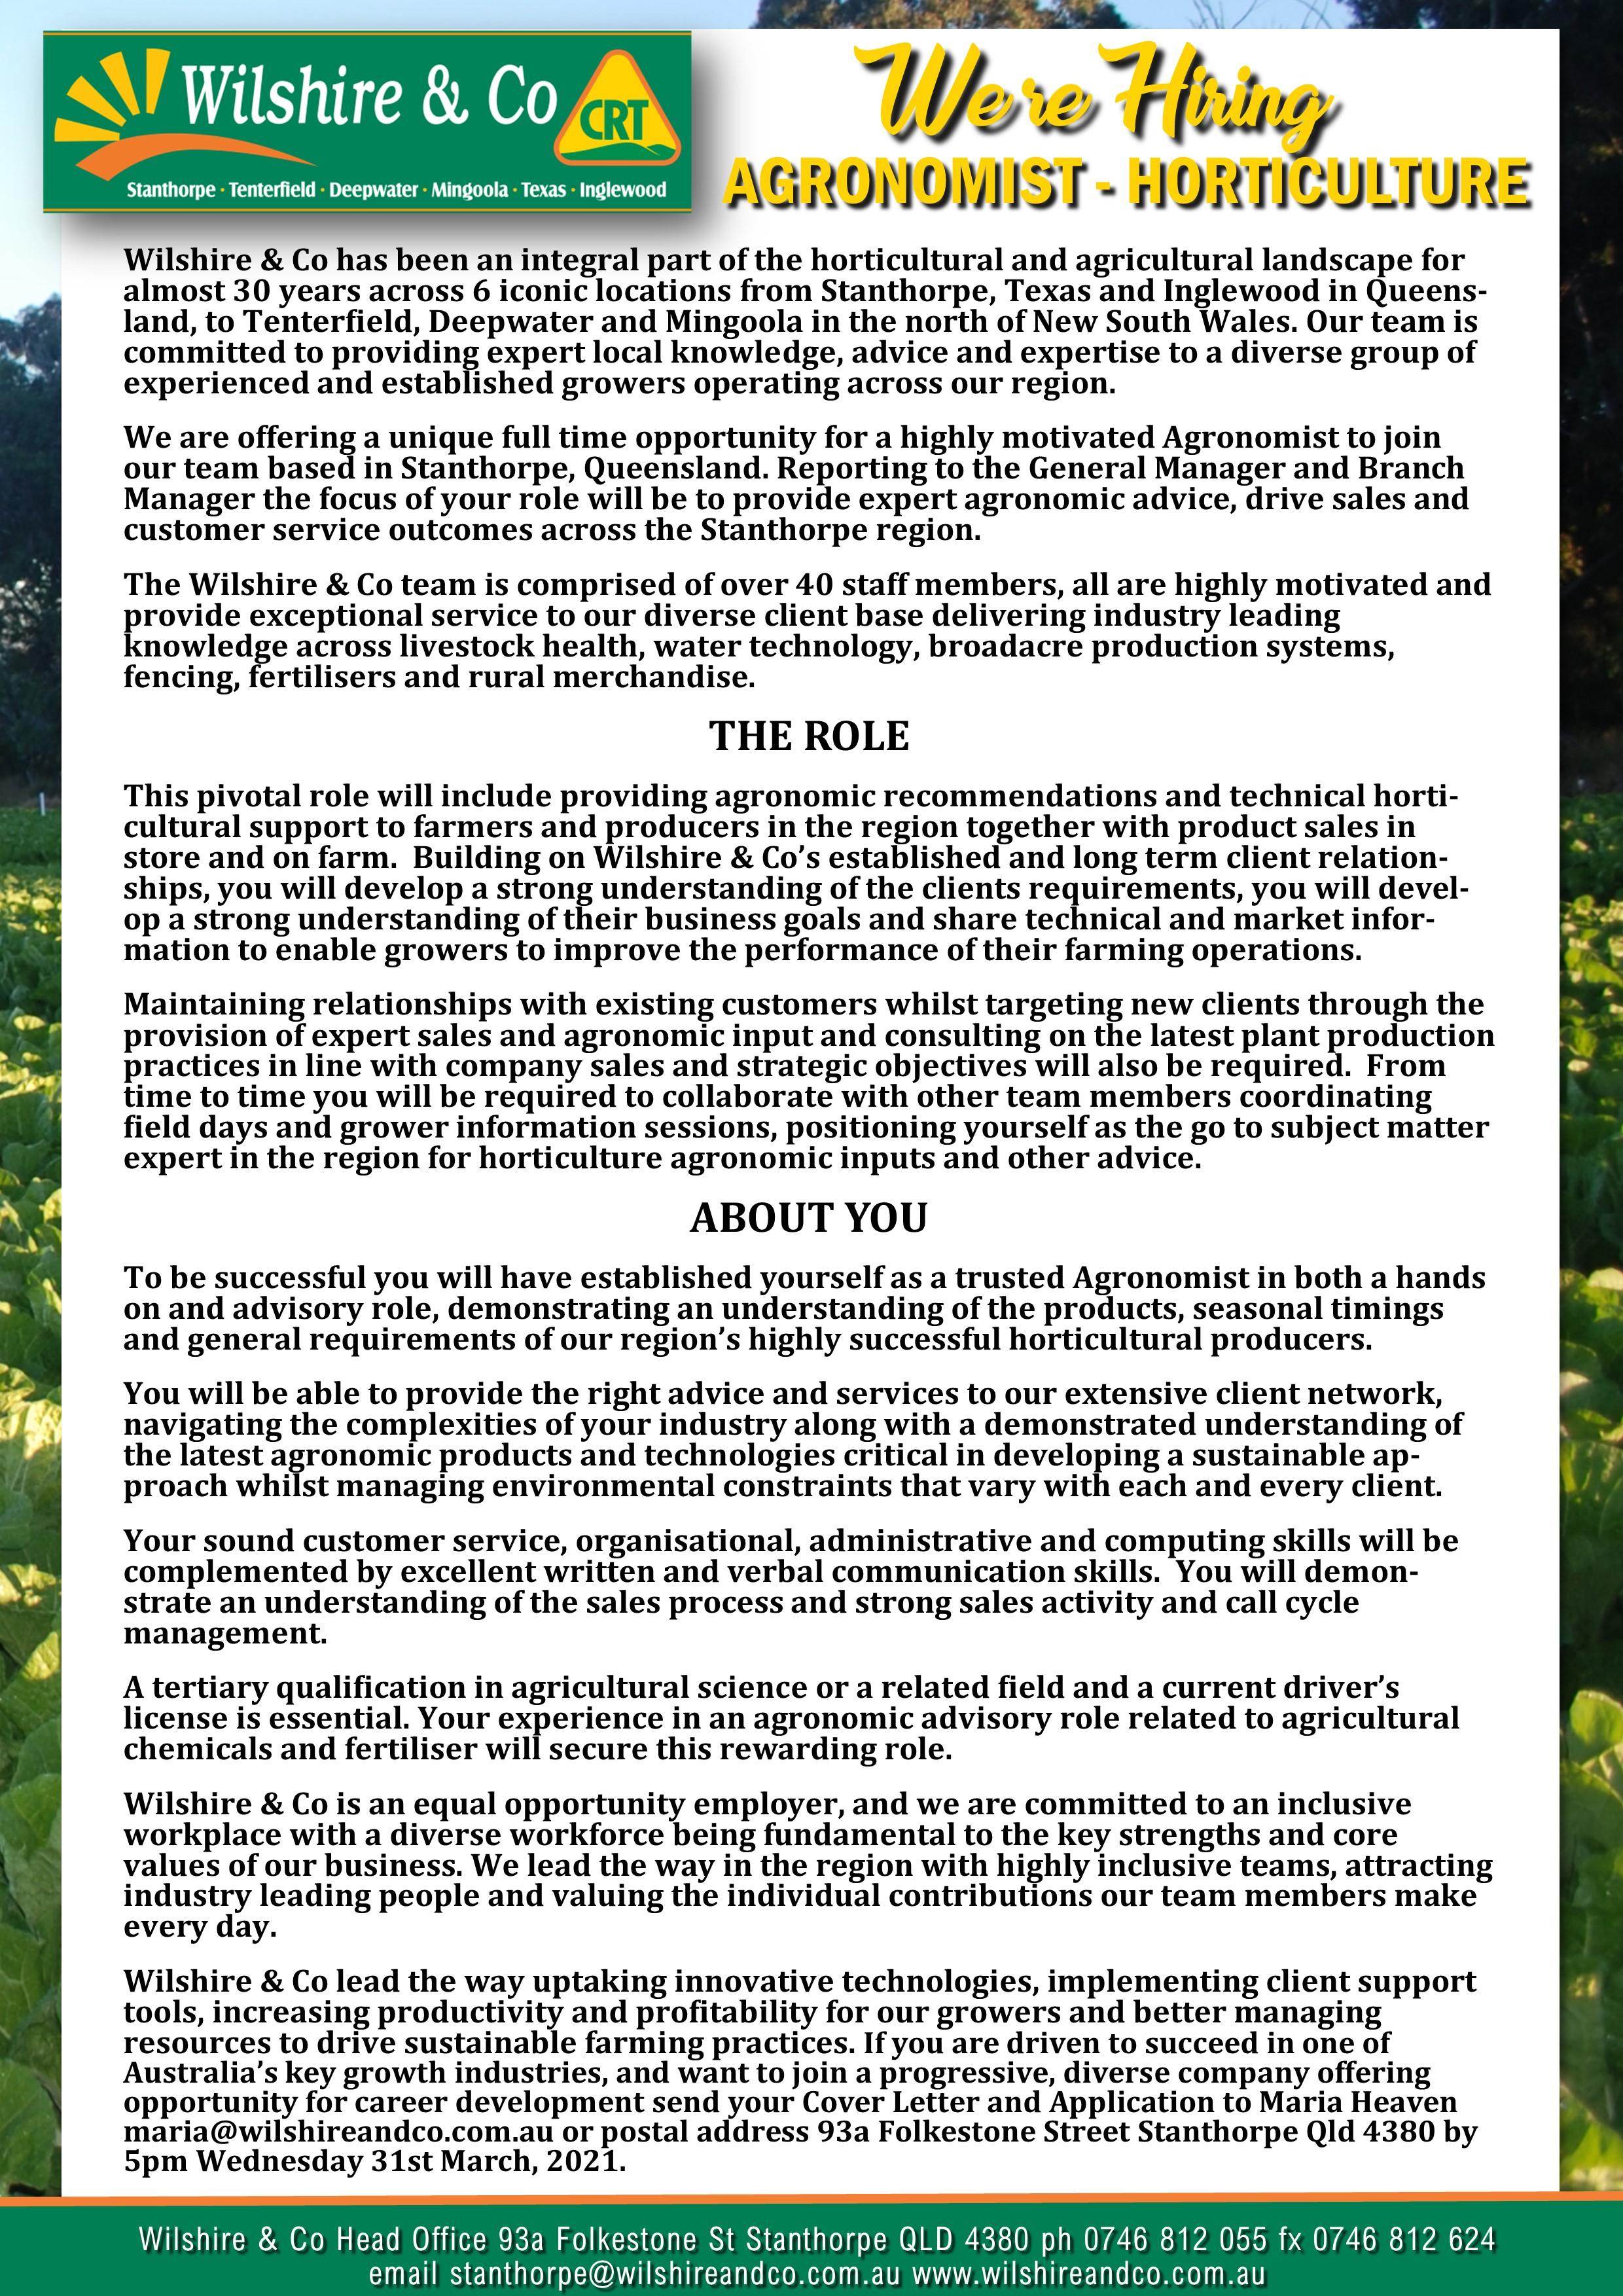 agronomist-position-vacant-2021.jpg